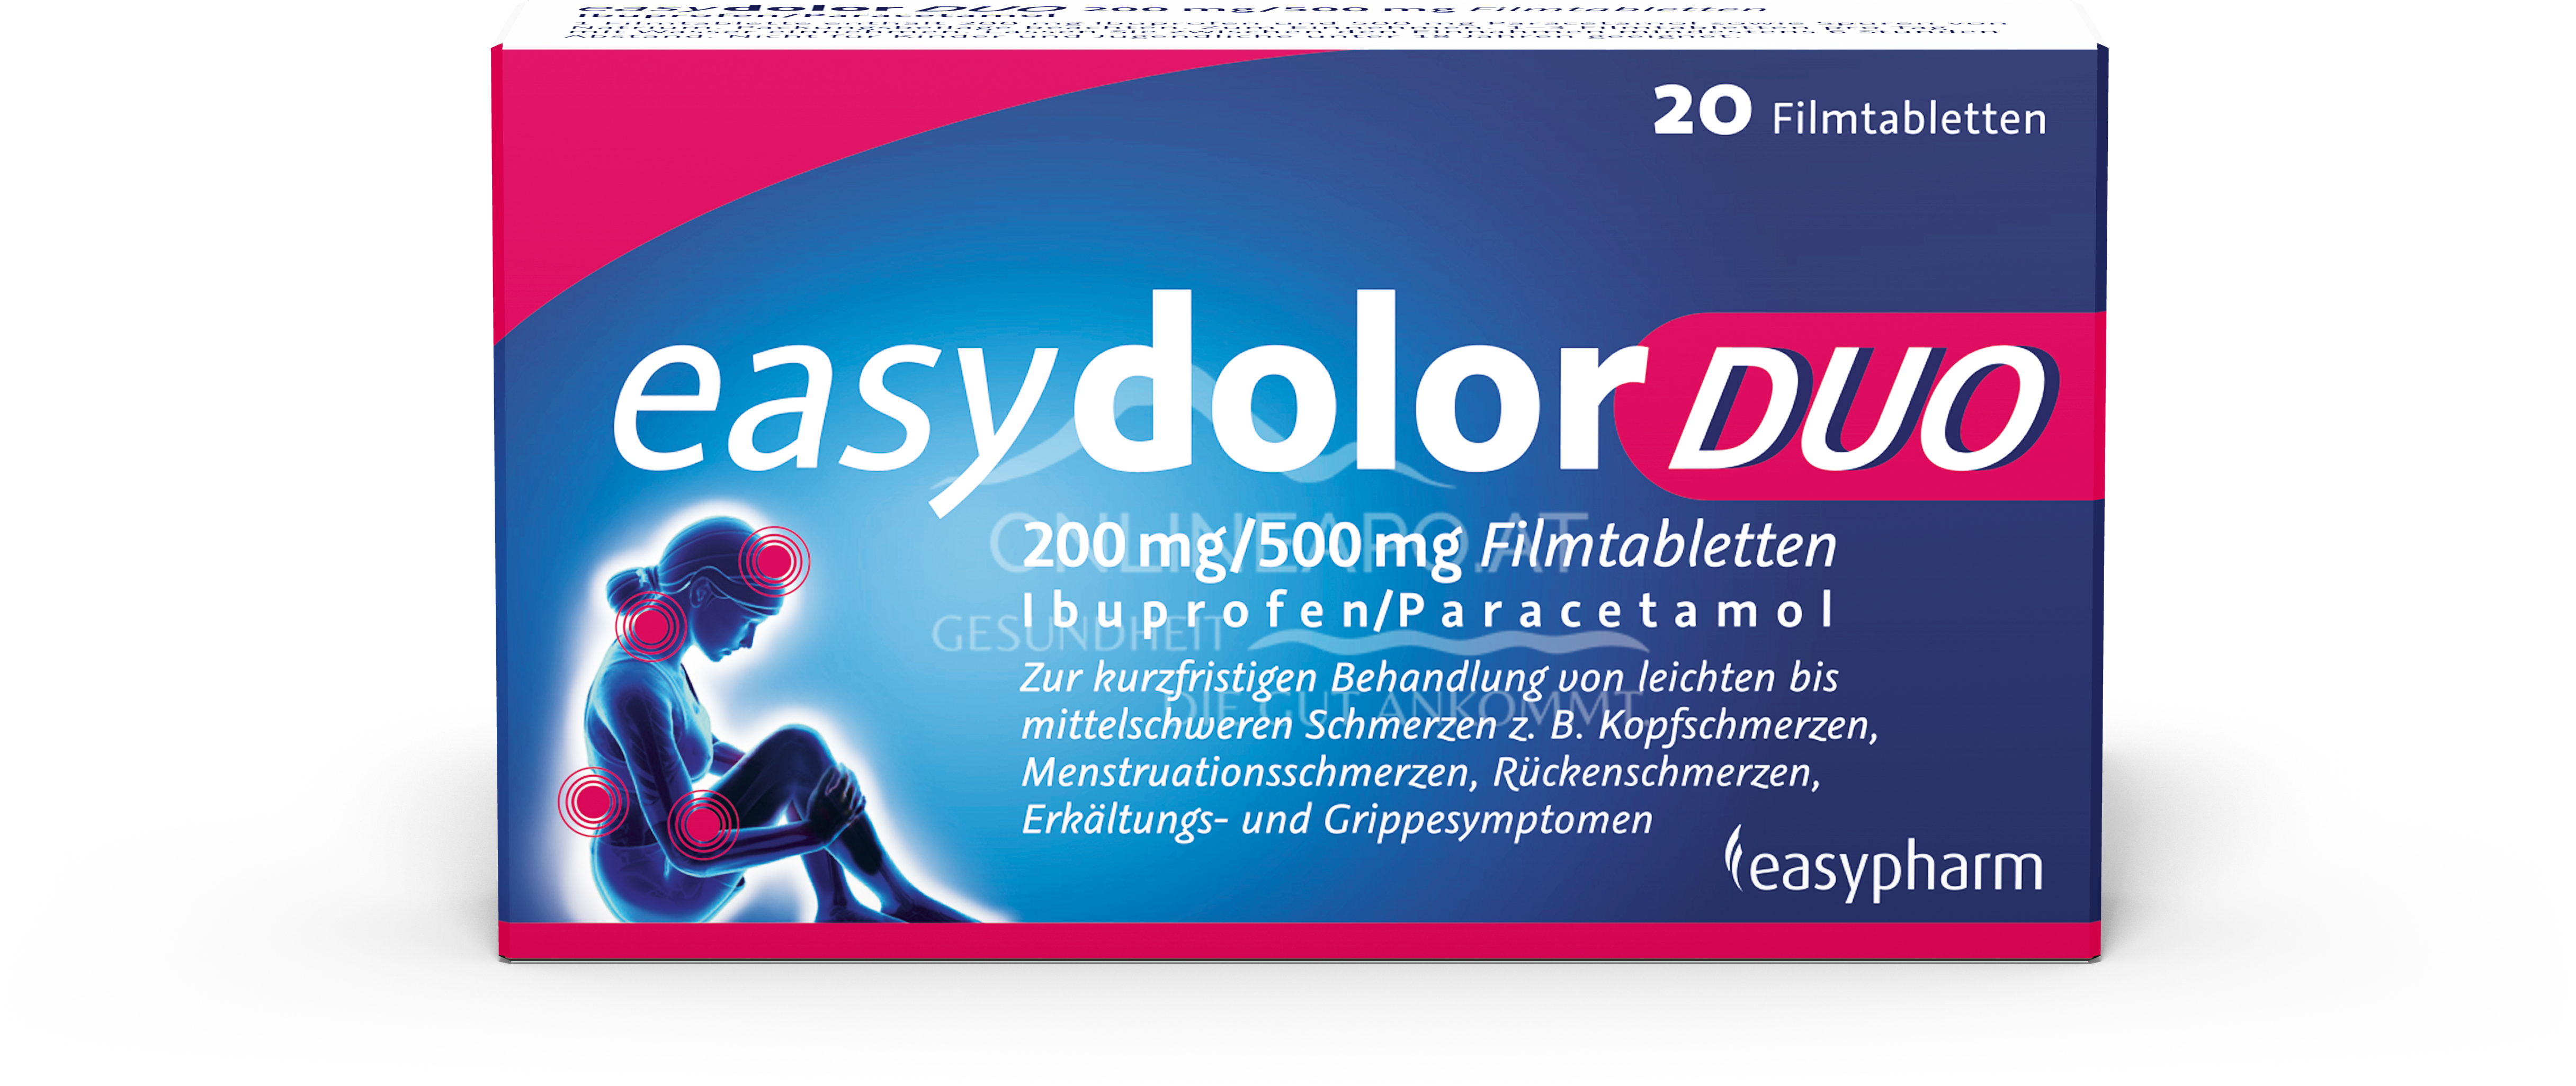 easydolor DUO 200 mg/500 mg Filmtabletten